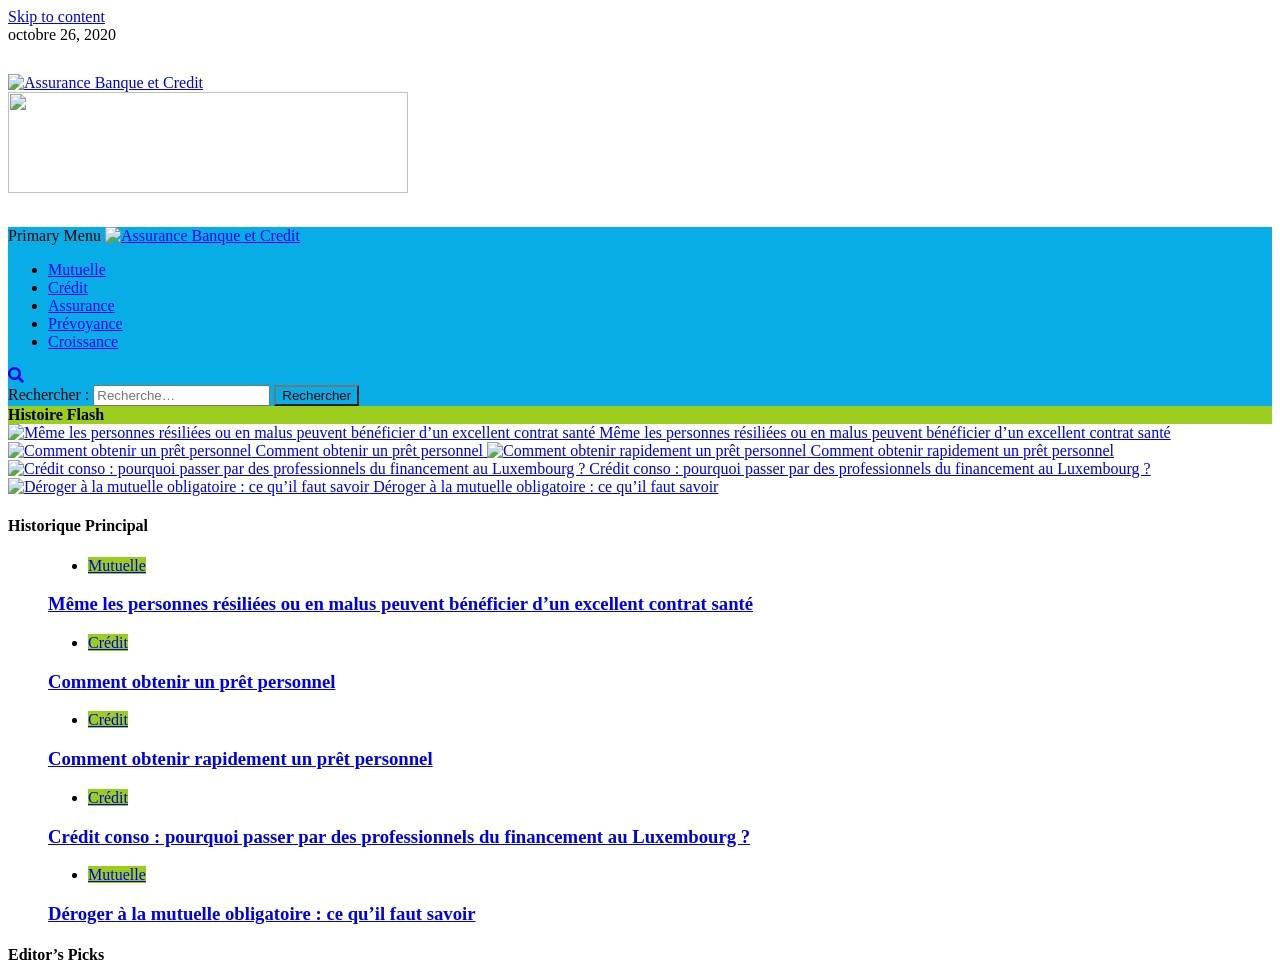 assurancebanquecredit.fr